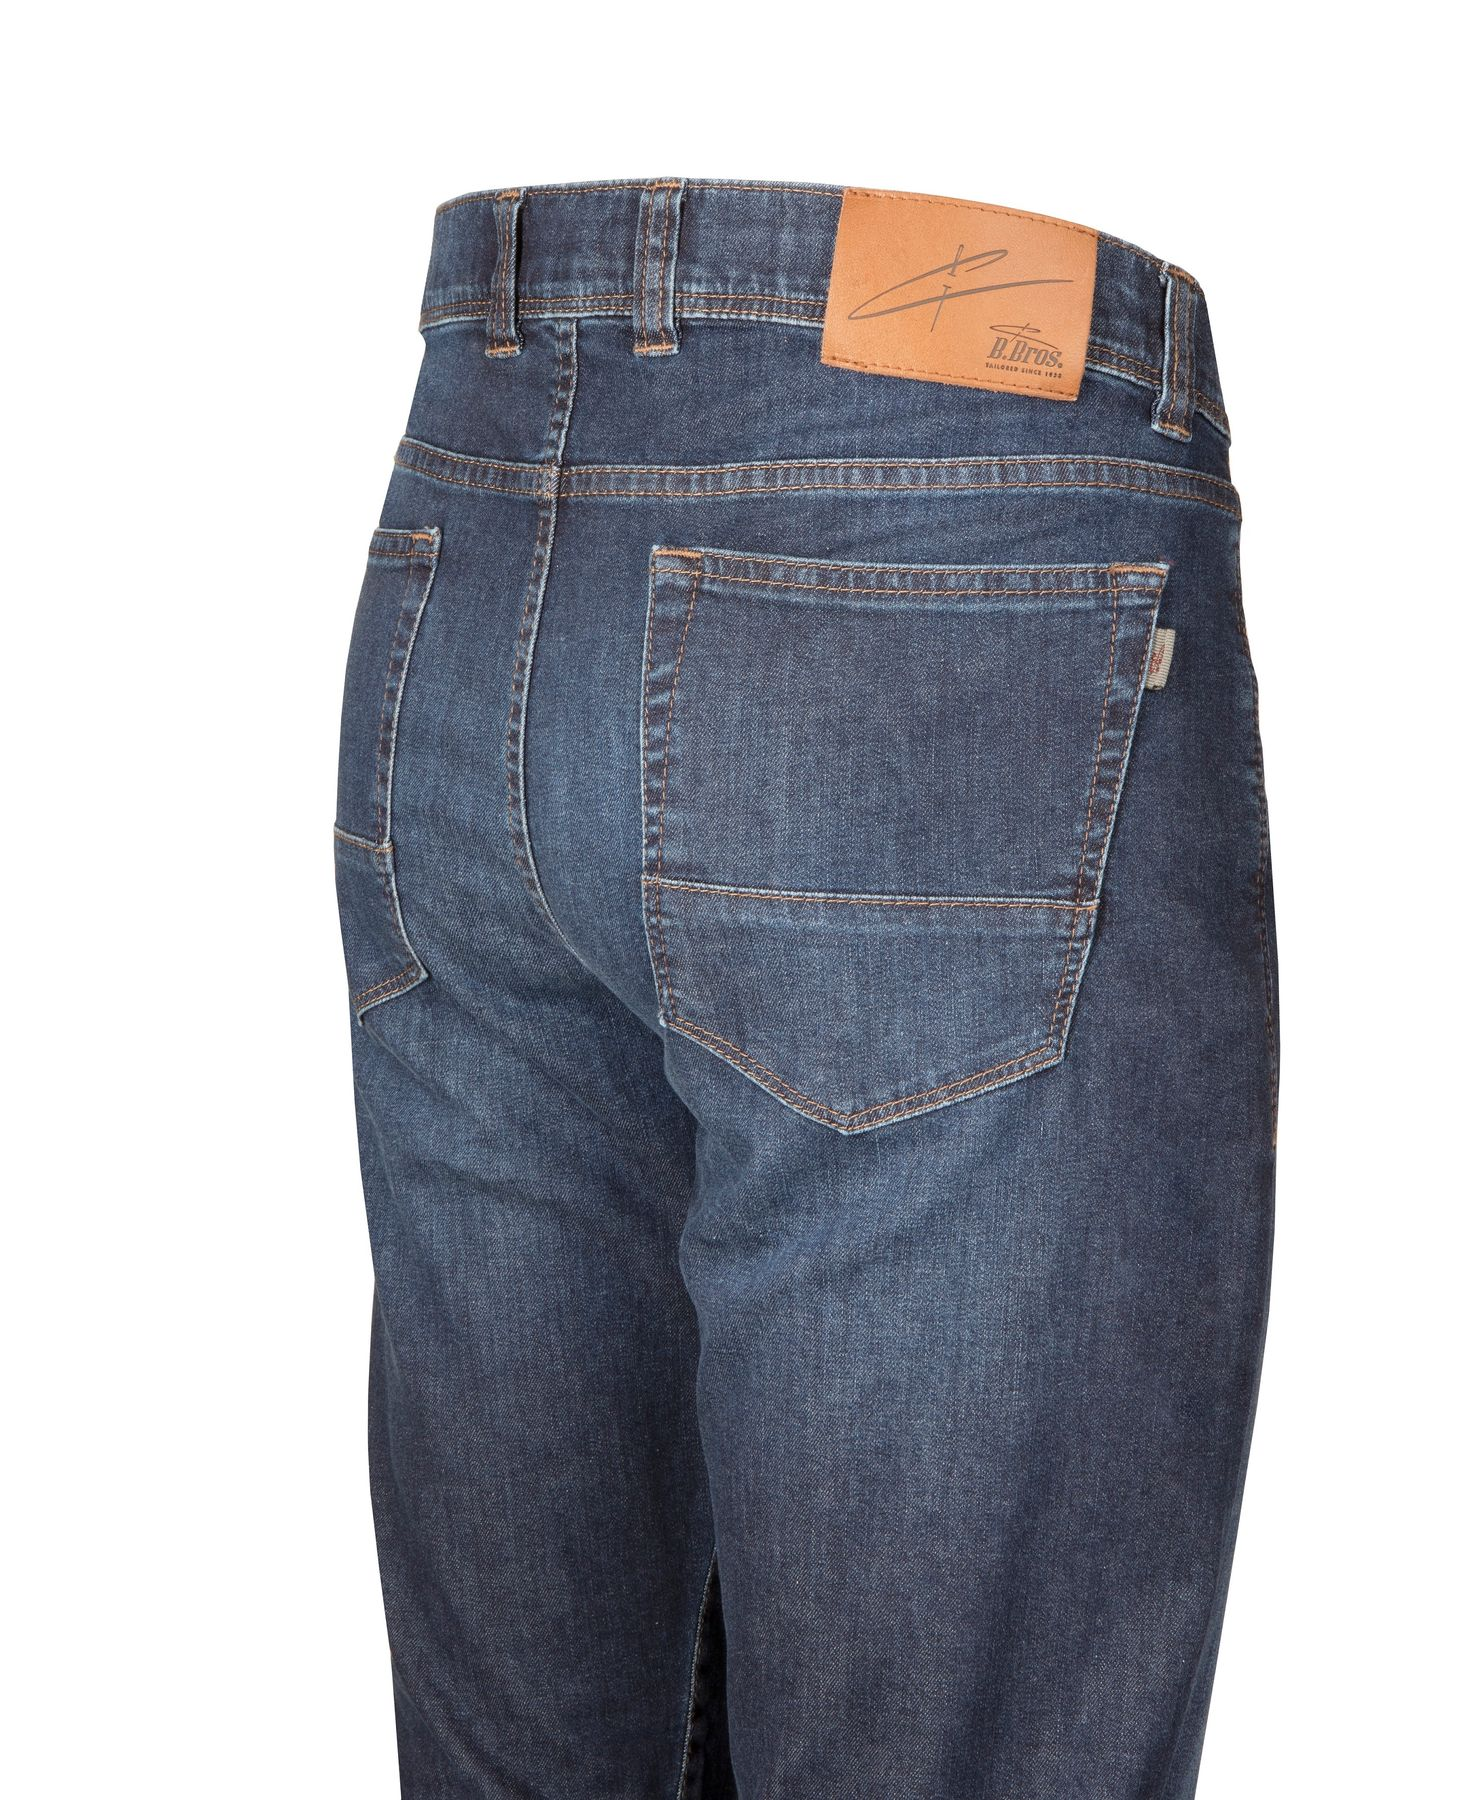 Brühl - Herren 5-Pocket Jeans in verschiedenen Farben, Maro Do (0665191001100) – Bild 6